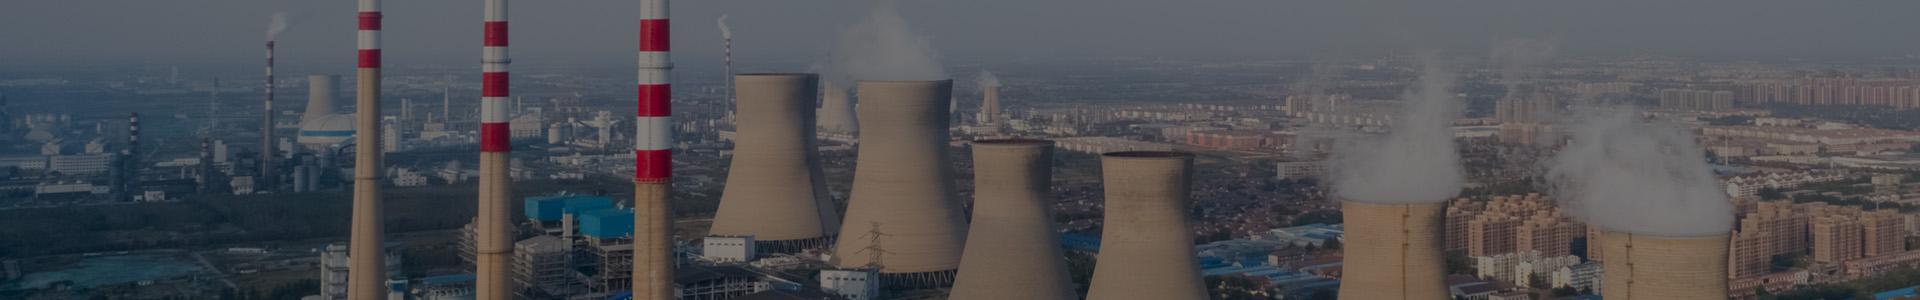 Steam and Gas Turbine Control